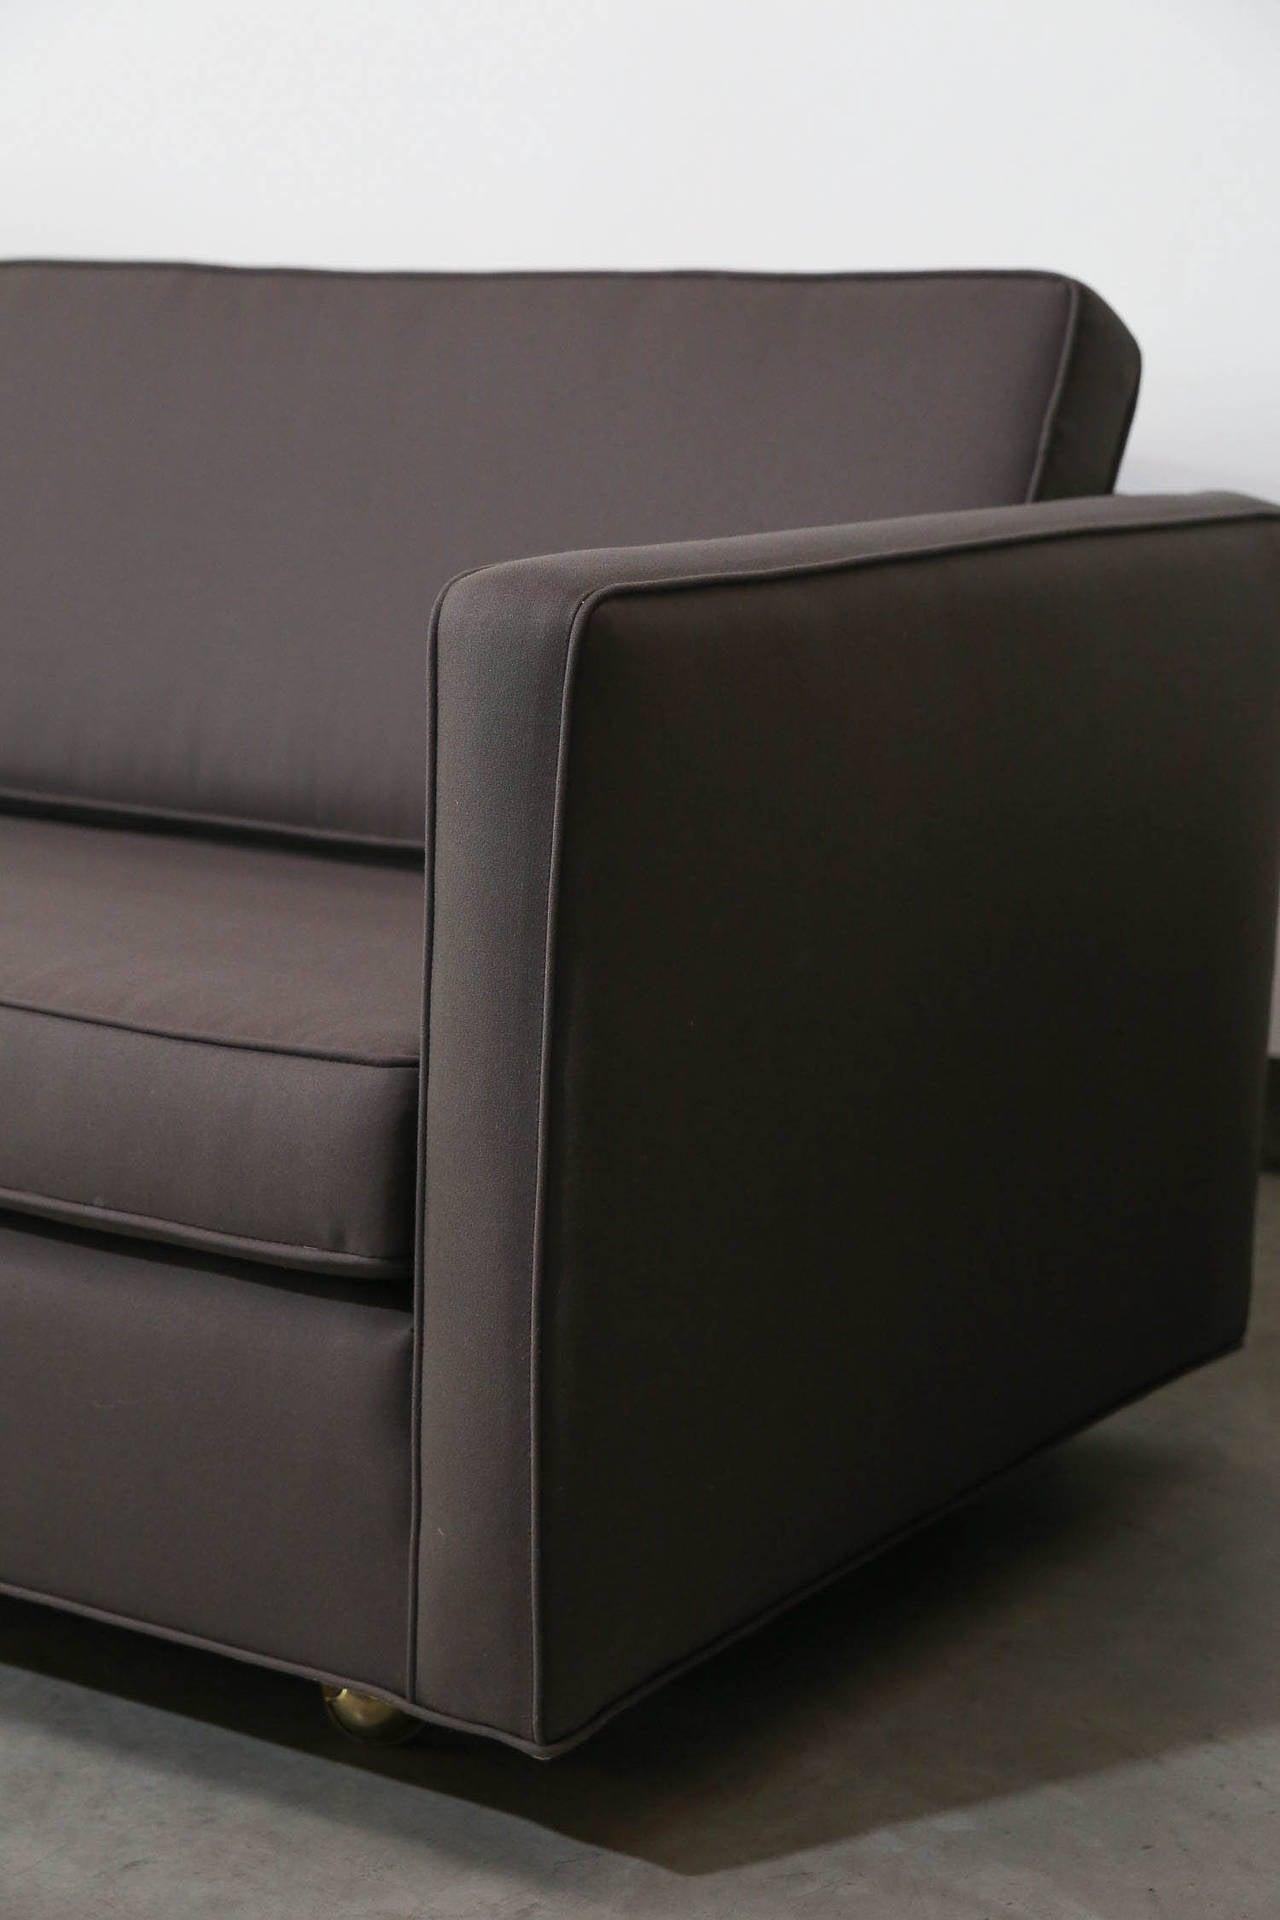 Harvey Probber Sofa At 1stdibs